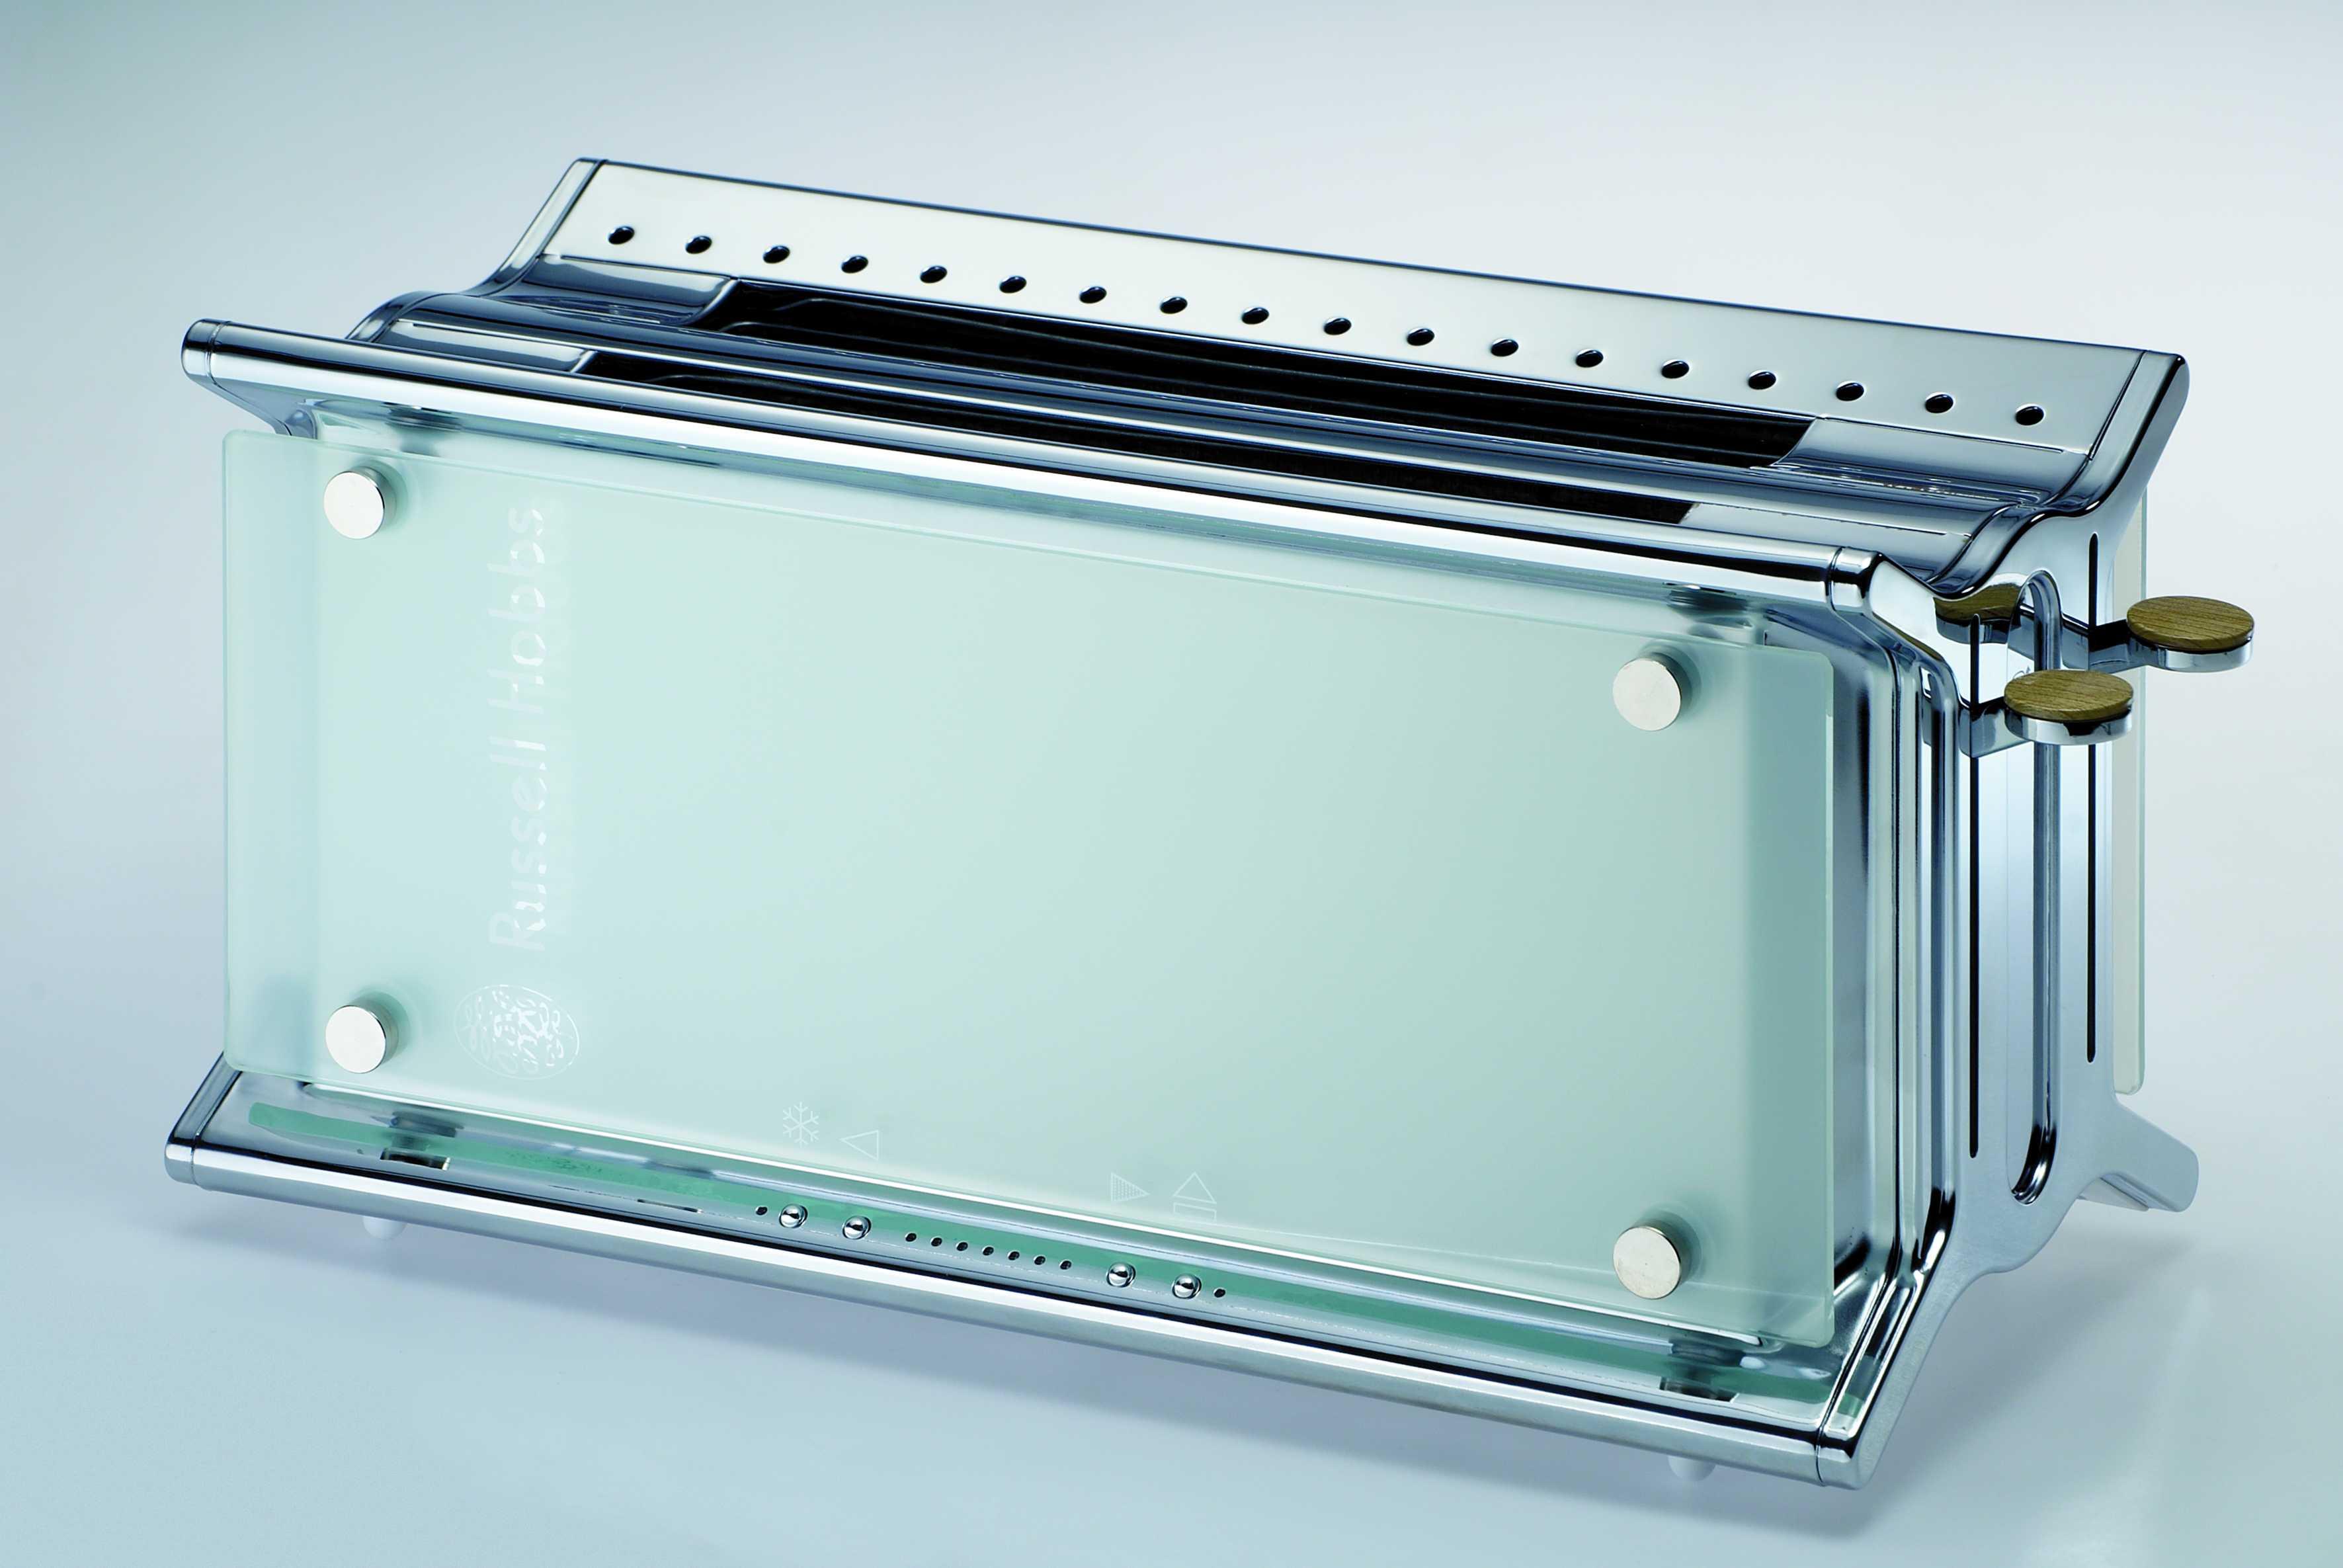 Russel Hobbs 4 Slice Glass Toaster PAM by Russel Hobbs